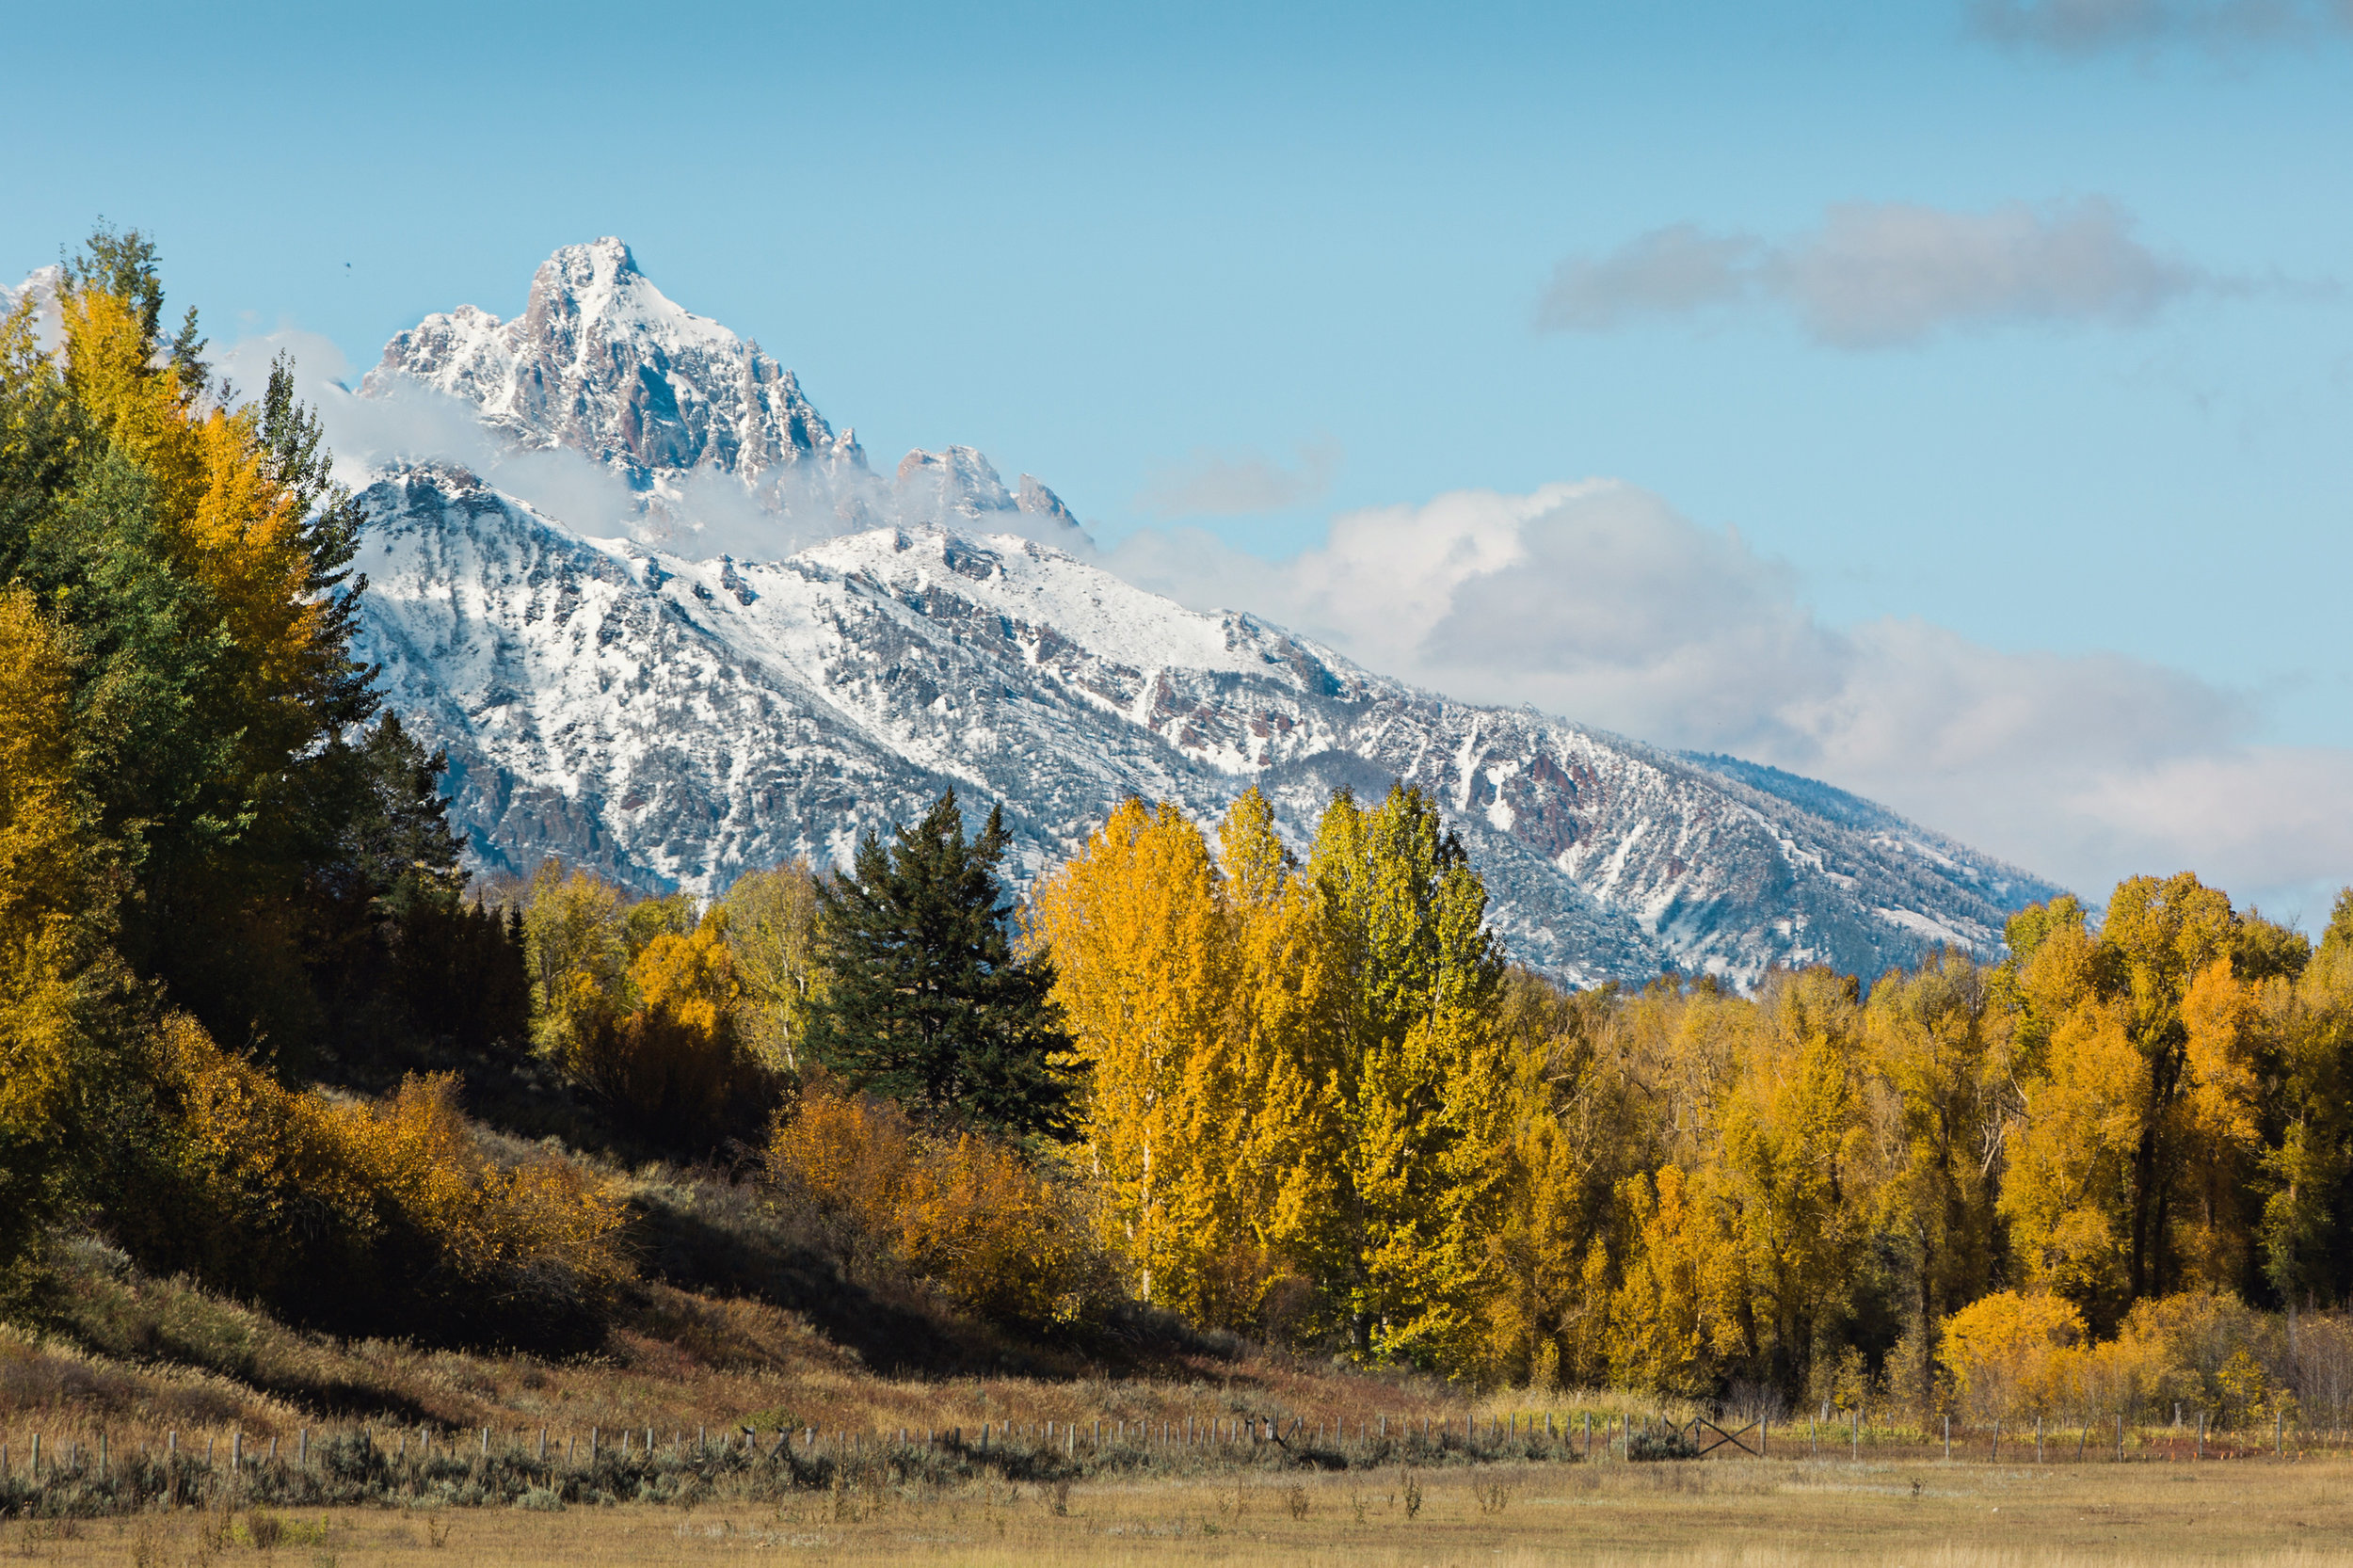 Cindy_Giovagnoli_Idaho_Wyoming_Grand_Teton_National_Park_autumn_aspens_camping_mountains-022.jpg